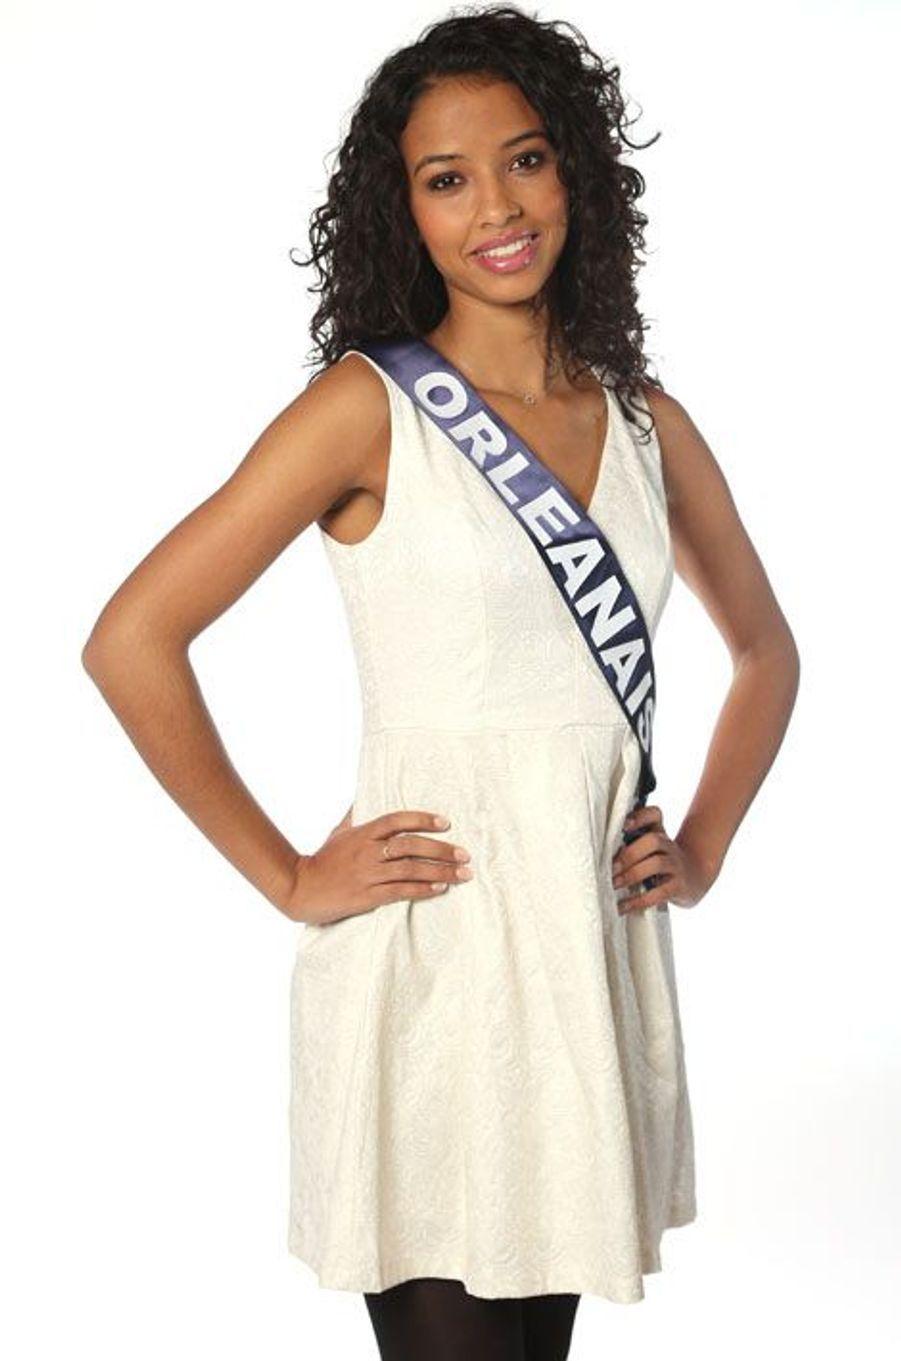 Flora Coquerel, 19 ans, Miss Orléanais